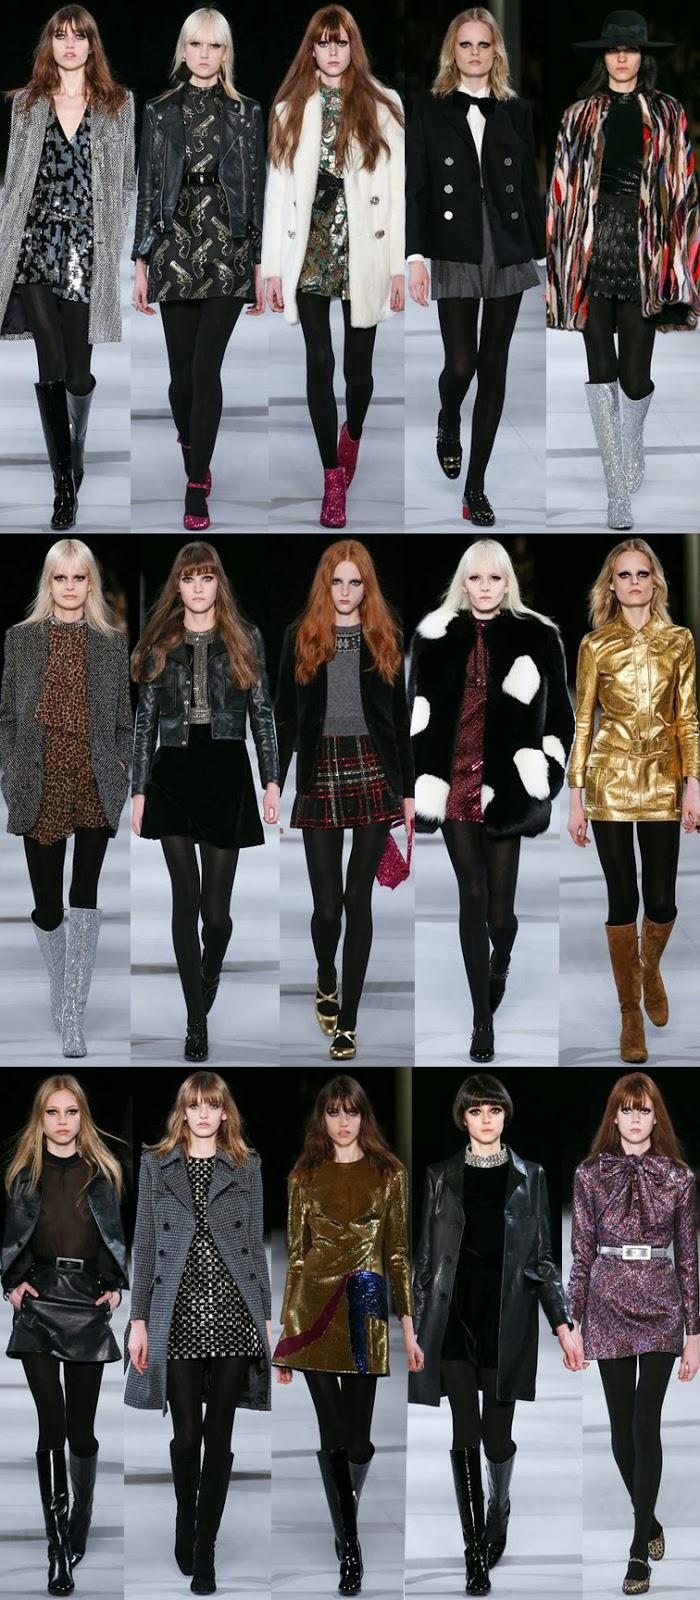 Saint Laurent by Hedi Slimane fall winter 2014 runway collection, PFW, Paris fashion week, FW14, AW14